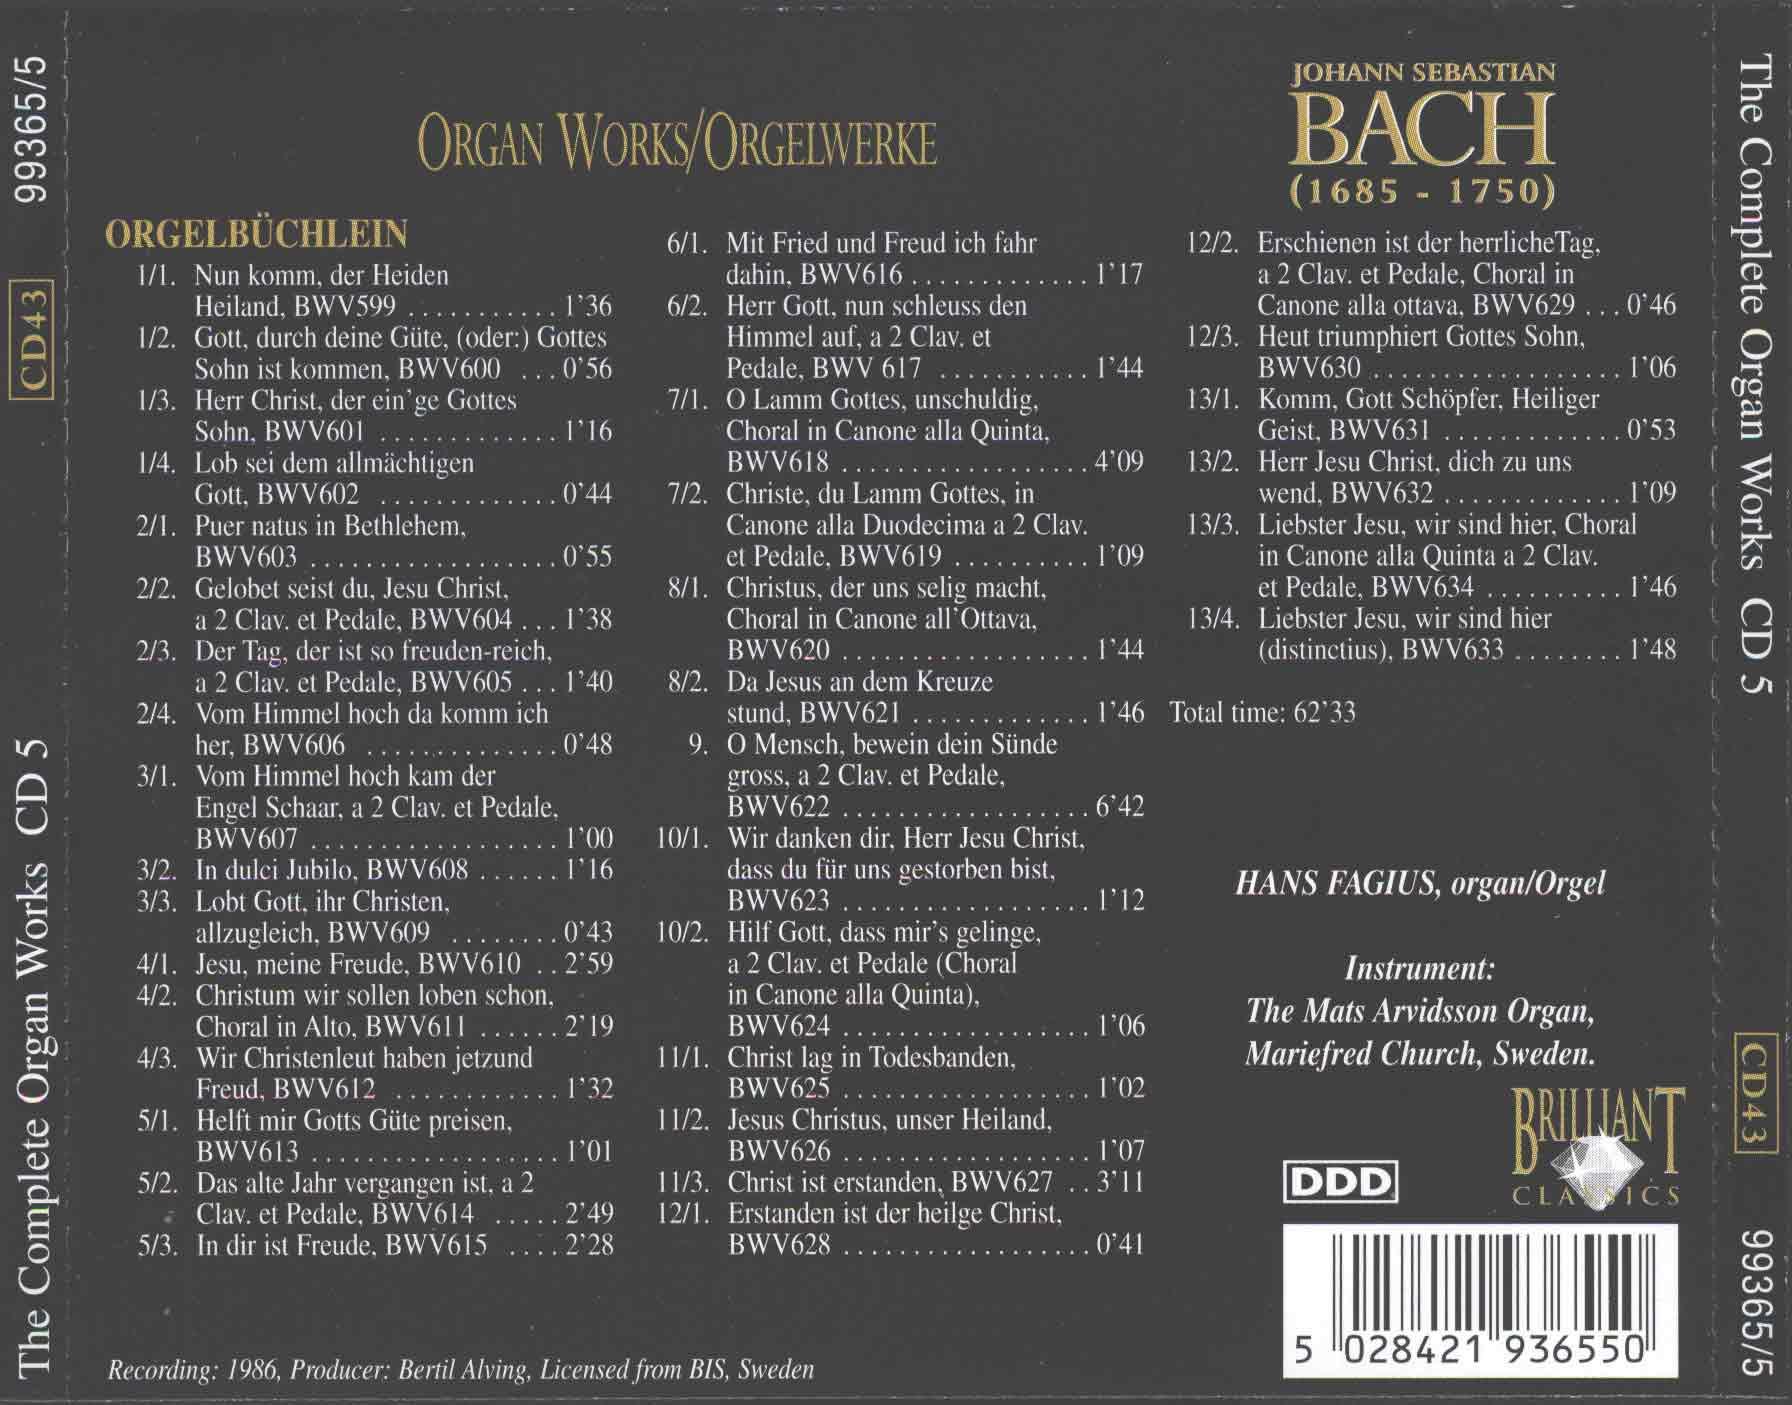 J.S.Bach - The Complete Organ Works CD 5 - Hans Fagius